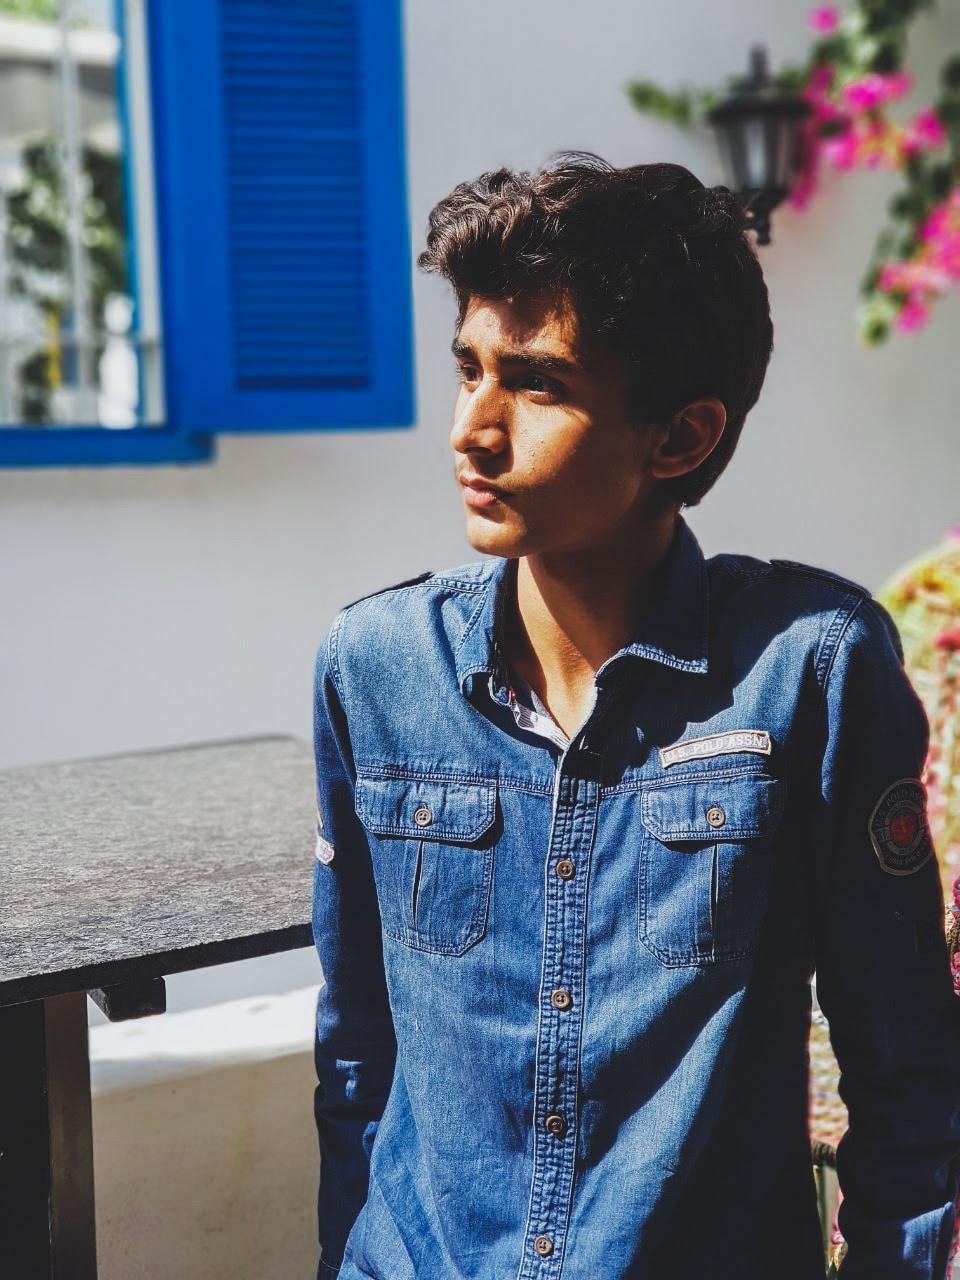 Go to Pranav Dawar's profile